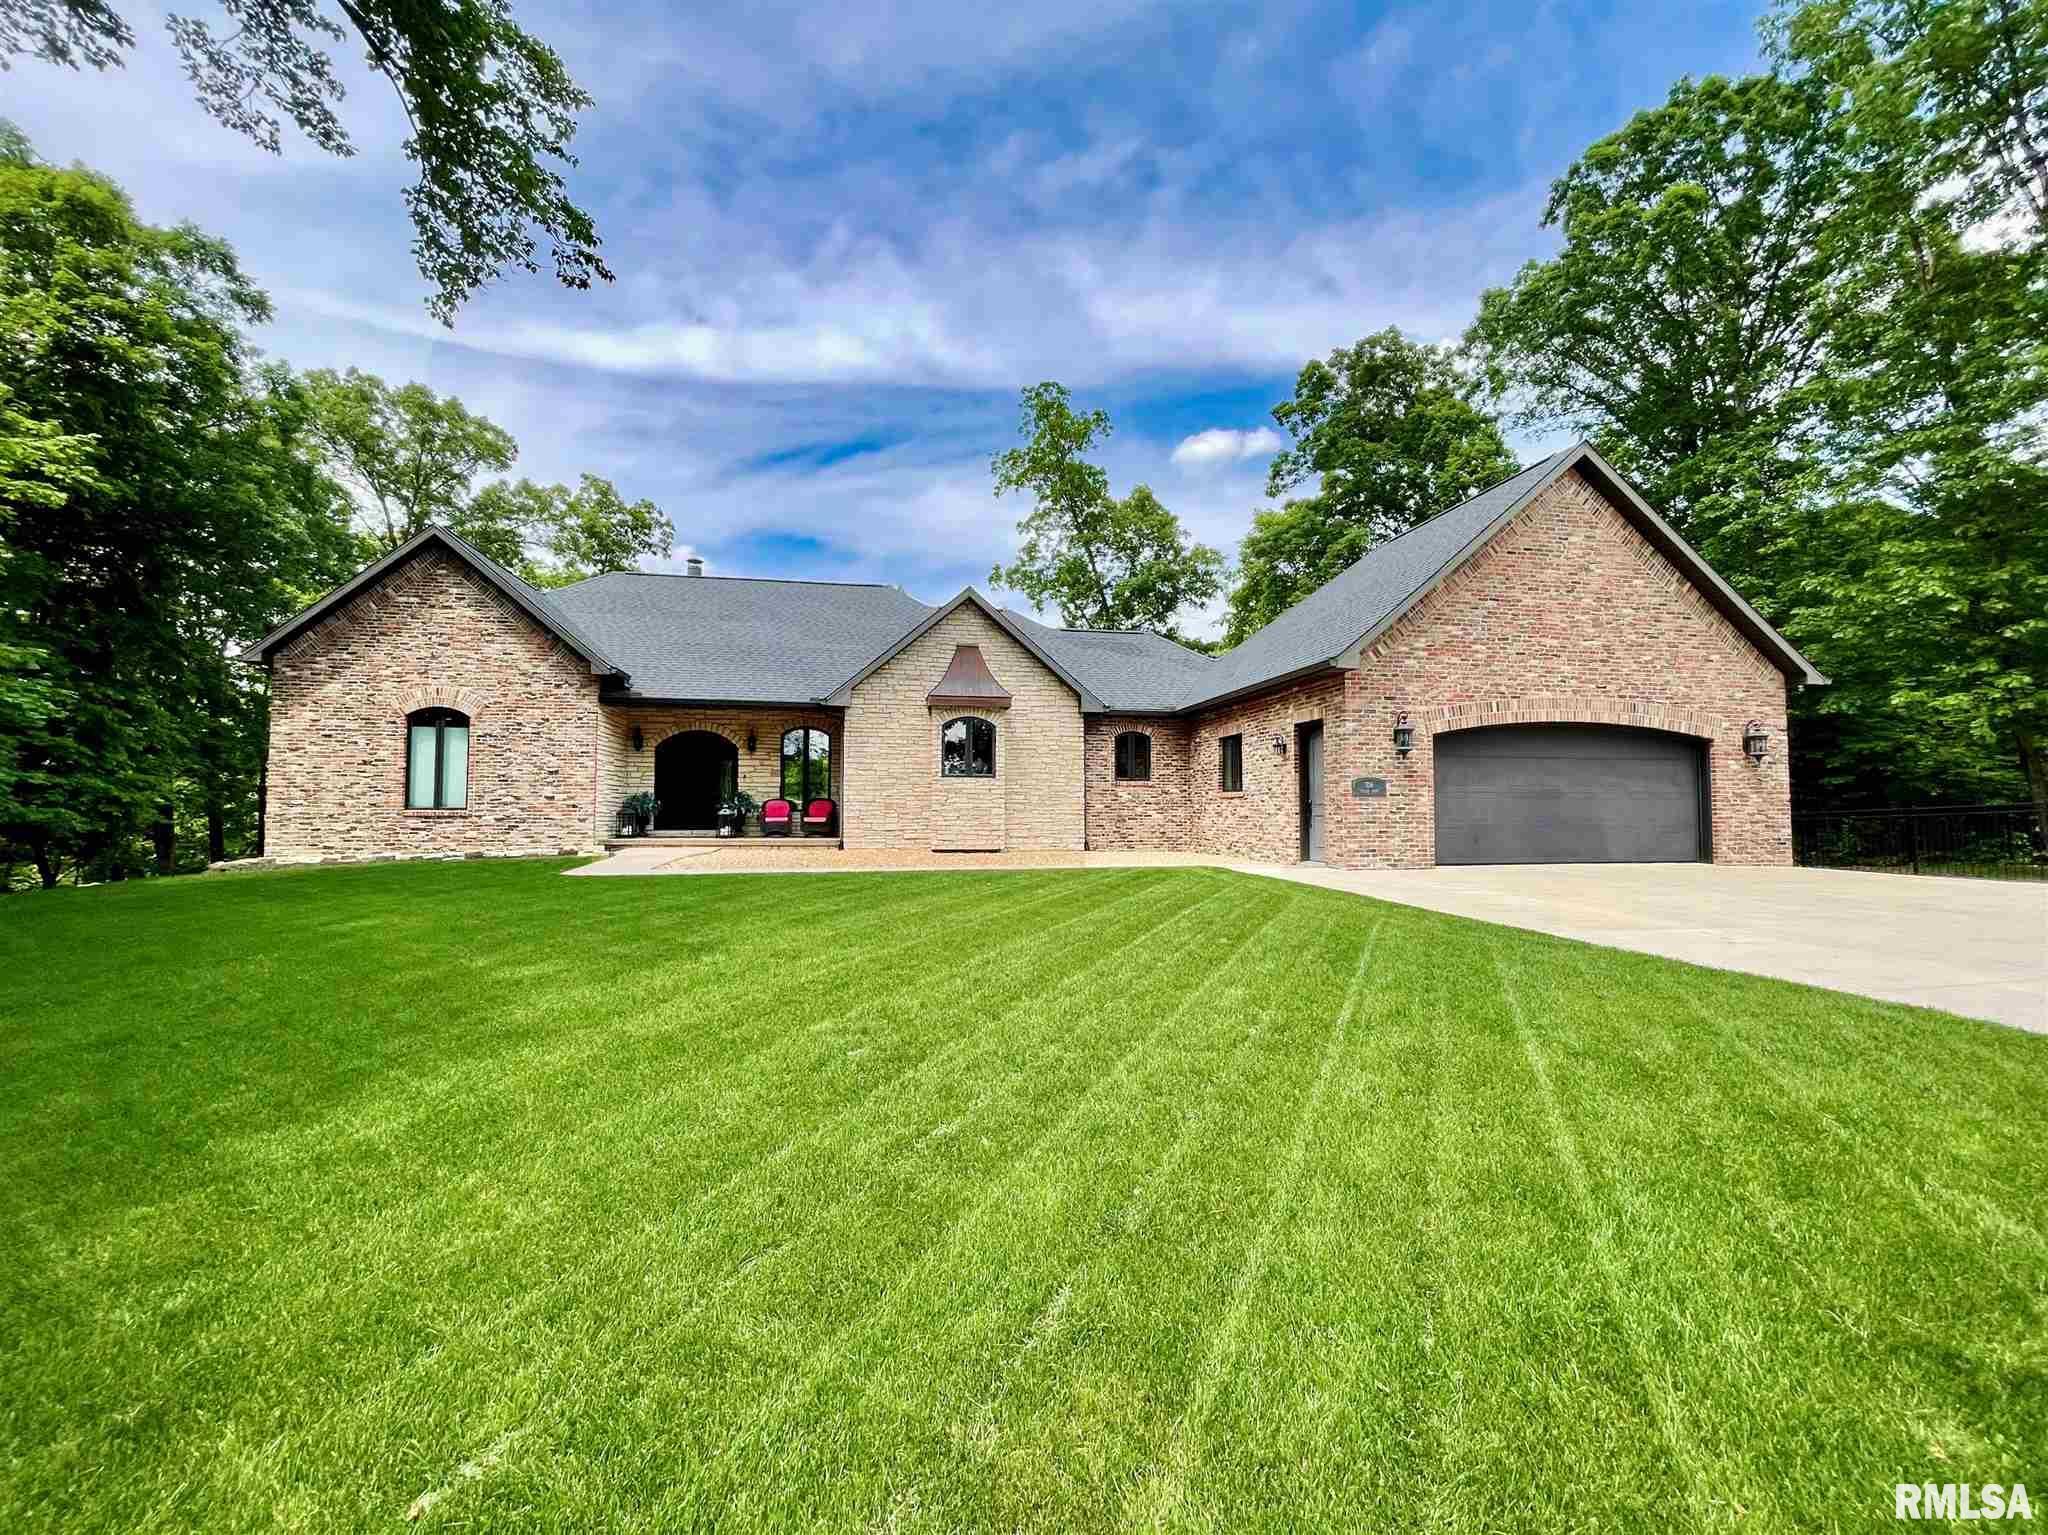 106 VILLAGE Property Photo - Washington, IL real estate listing